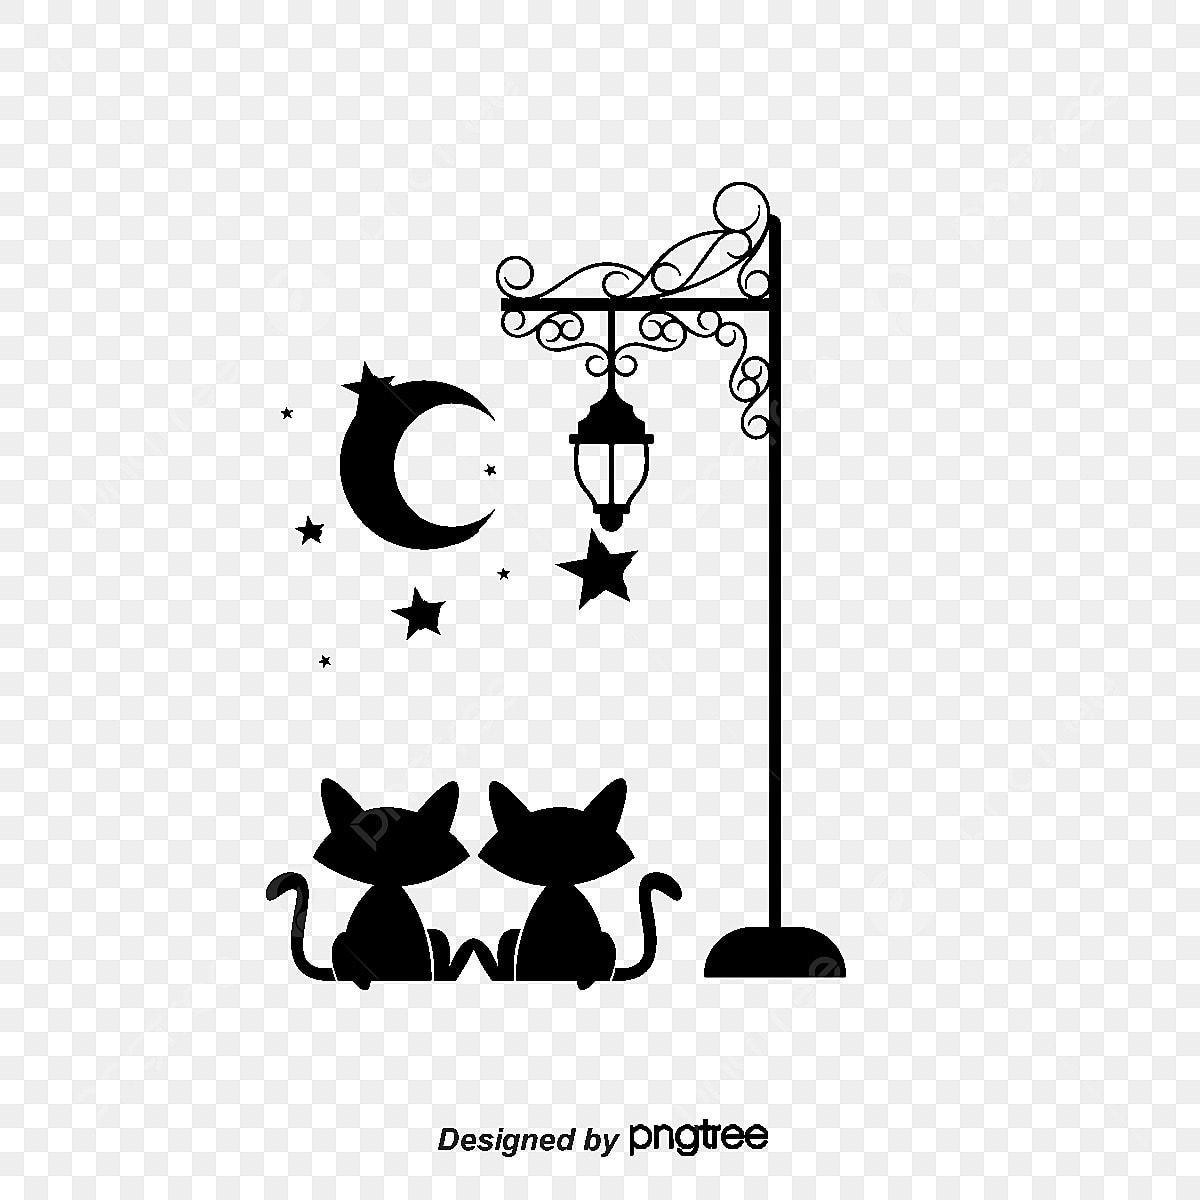 Cartoon Cat Wallpaper Black Little Cat Night Png And Vector